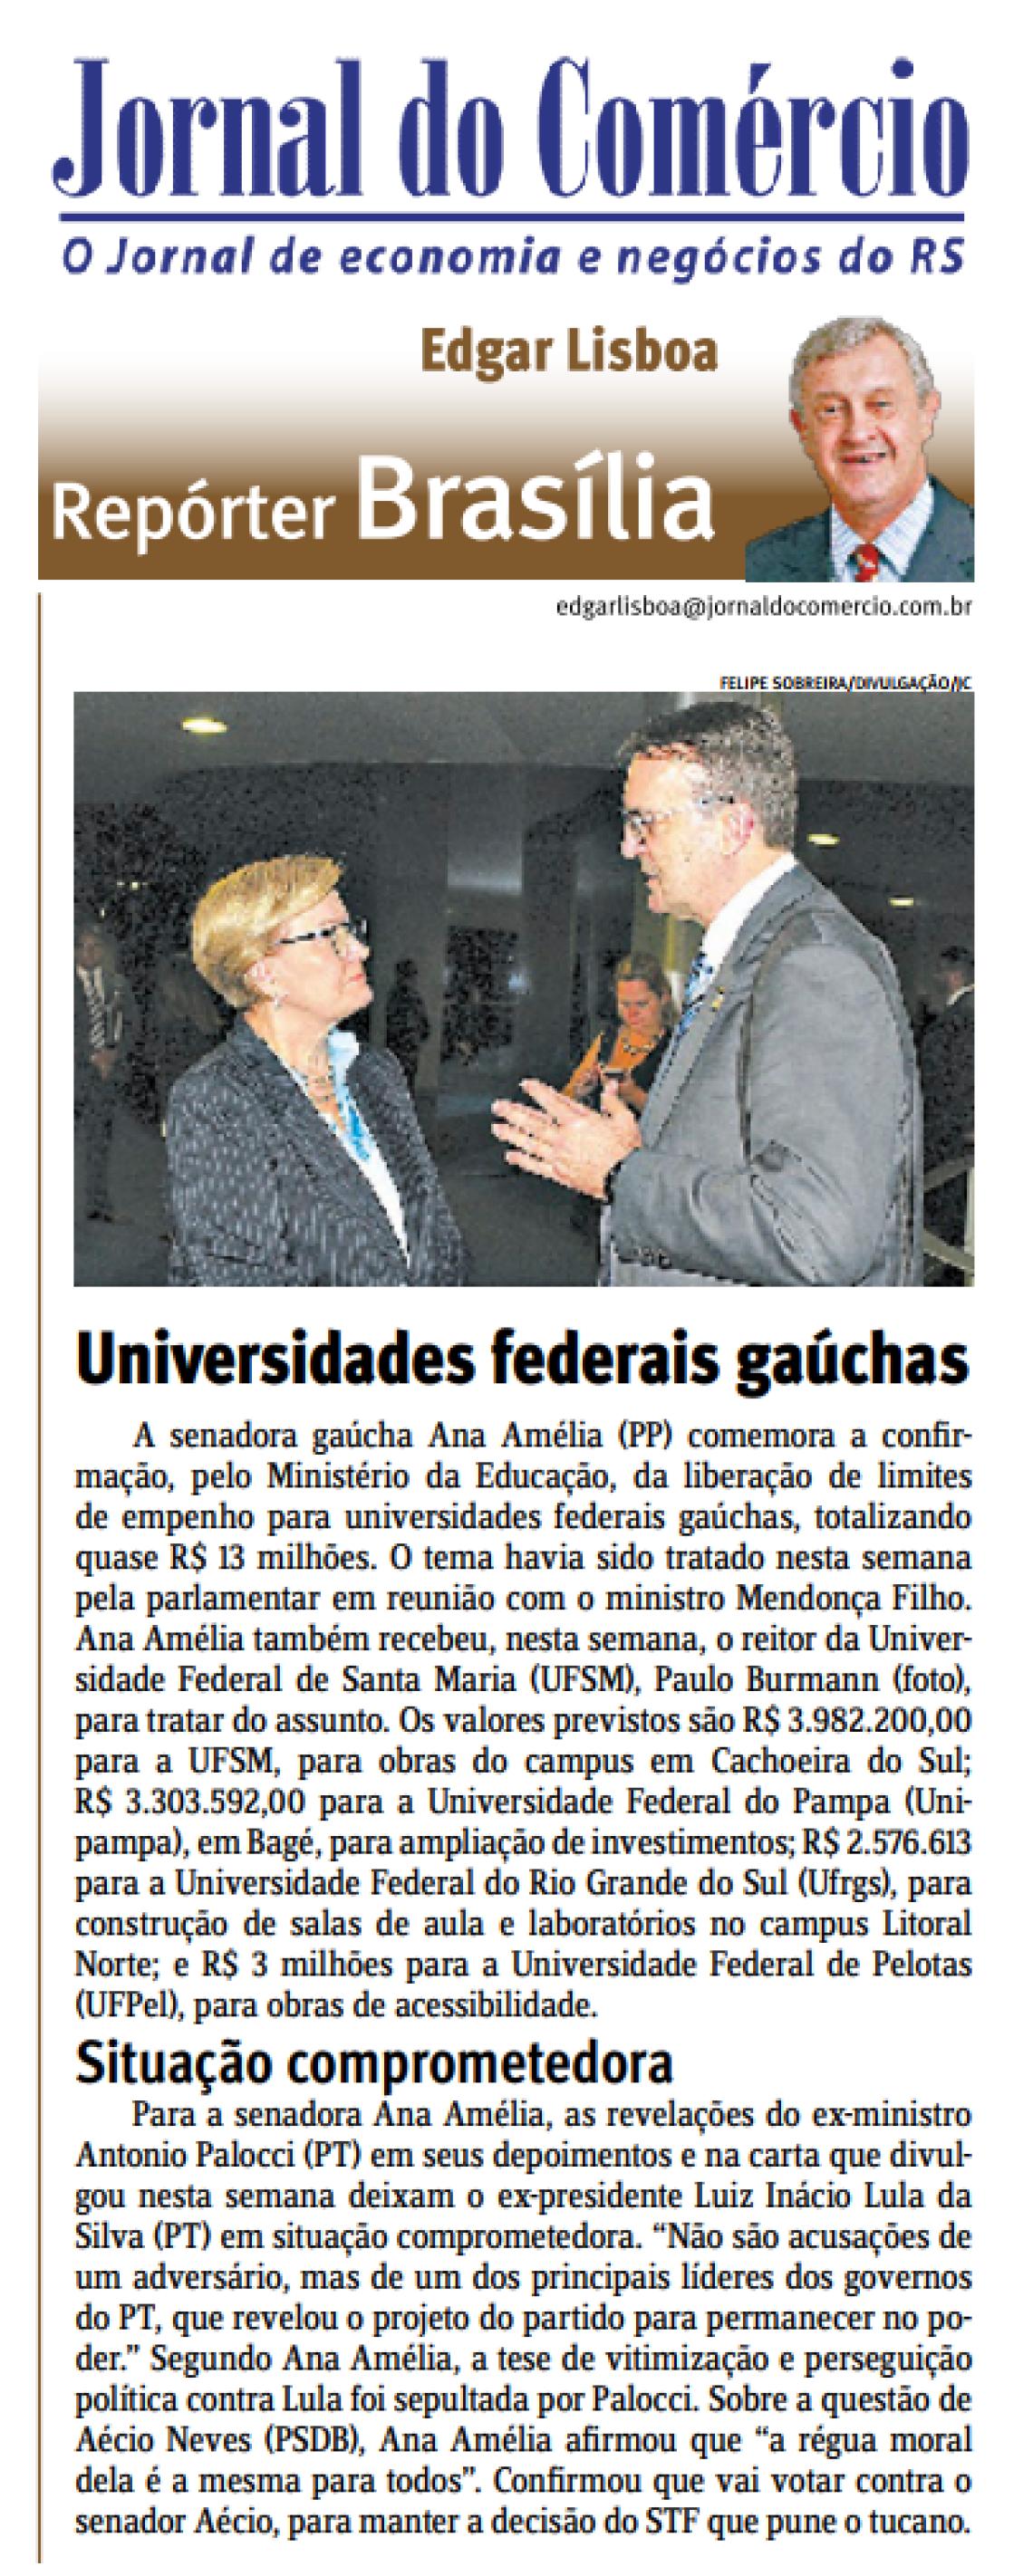 Jornal do Comércio: Edgar Lisboa - Universidades Federais gaúchas